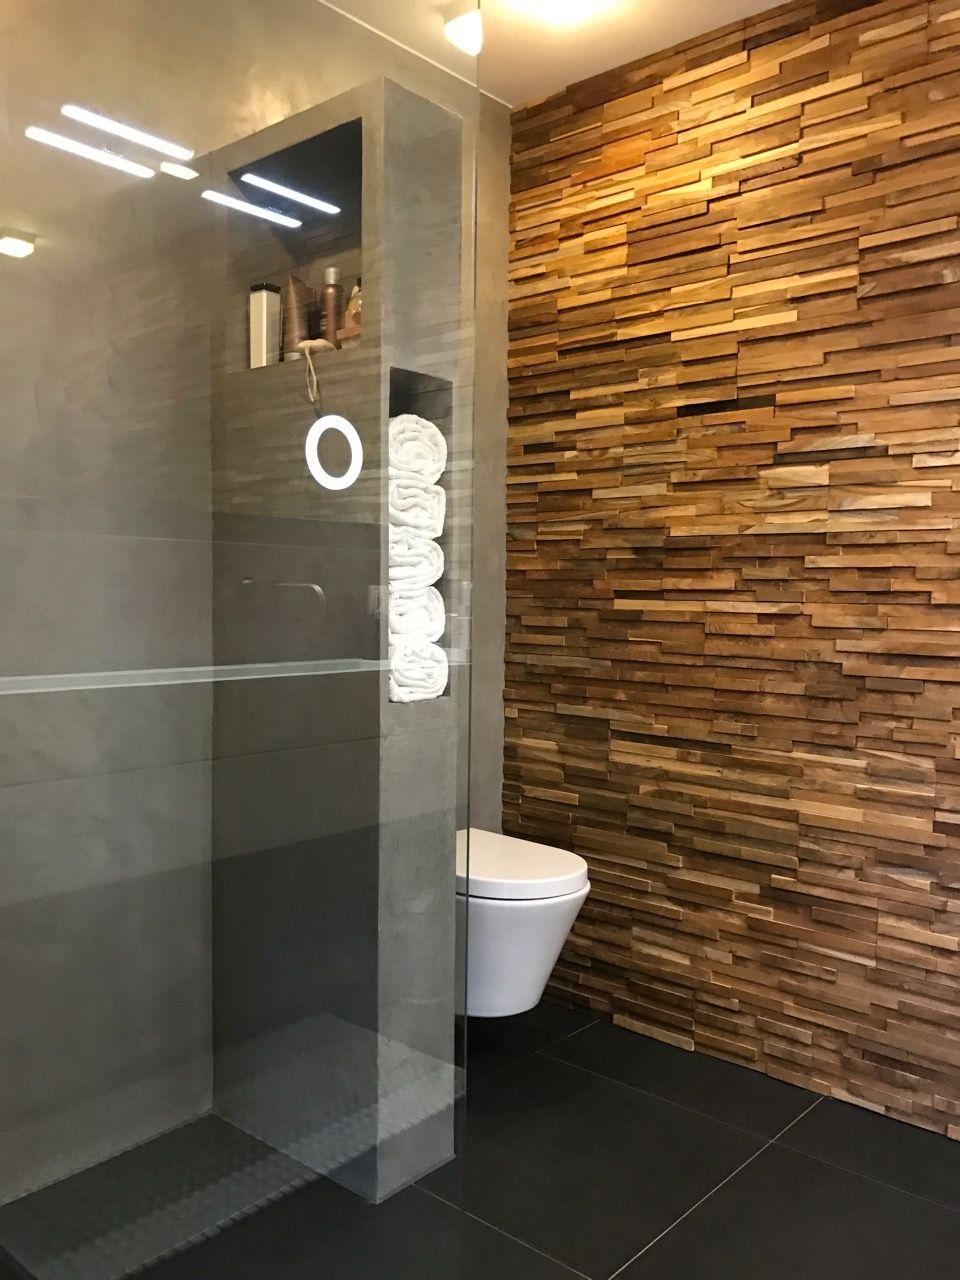 Hotel Chique Badkamer Eigen Huis Tuin Bathroom Ideas In 2018